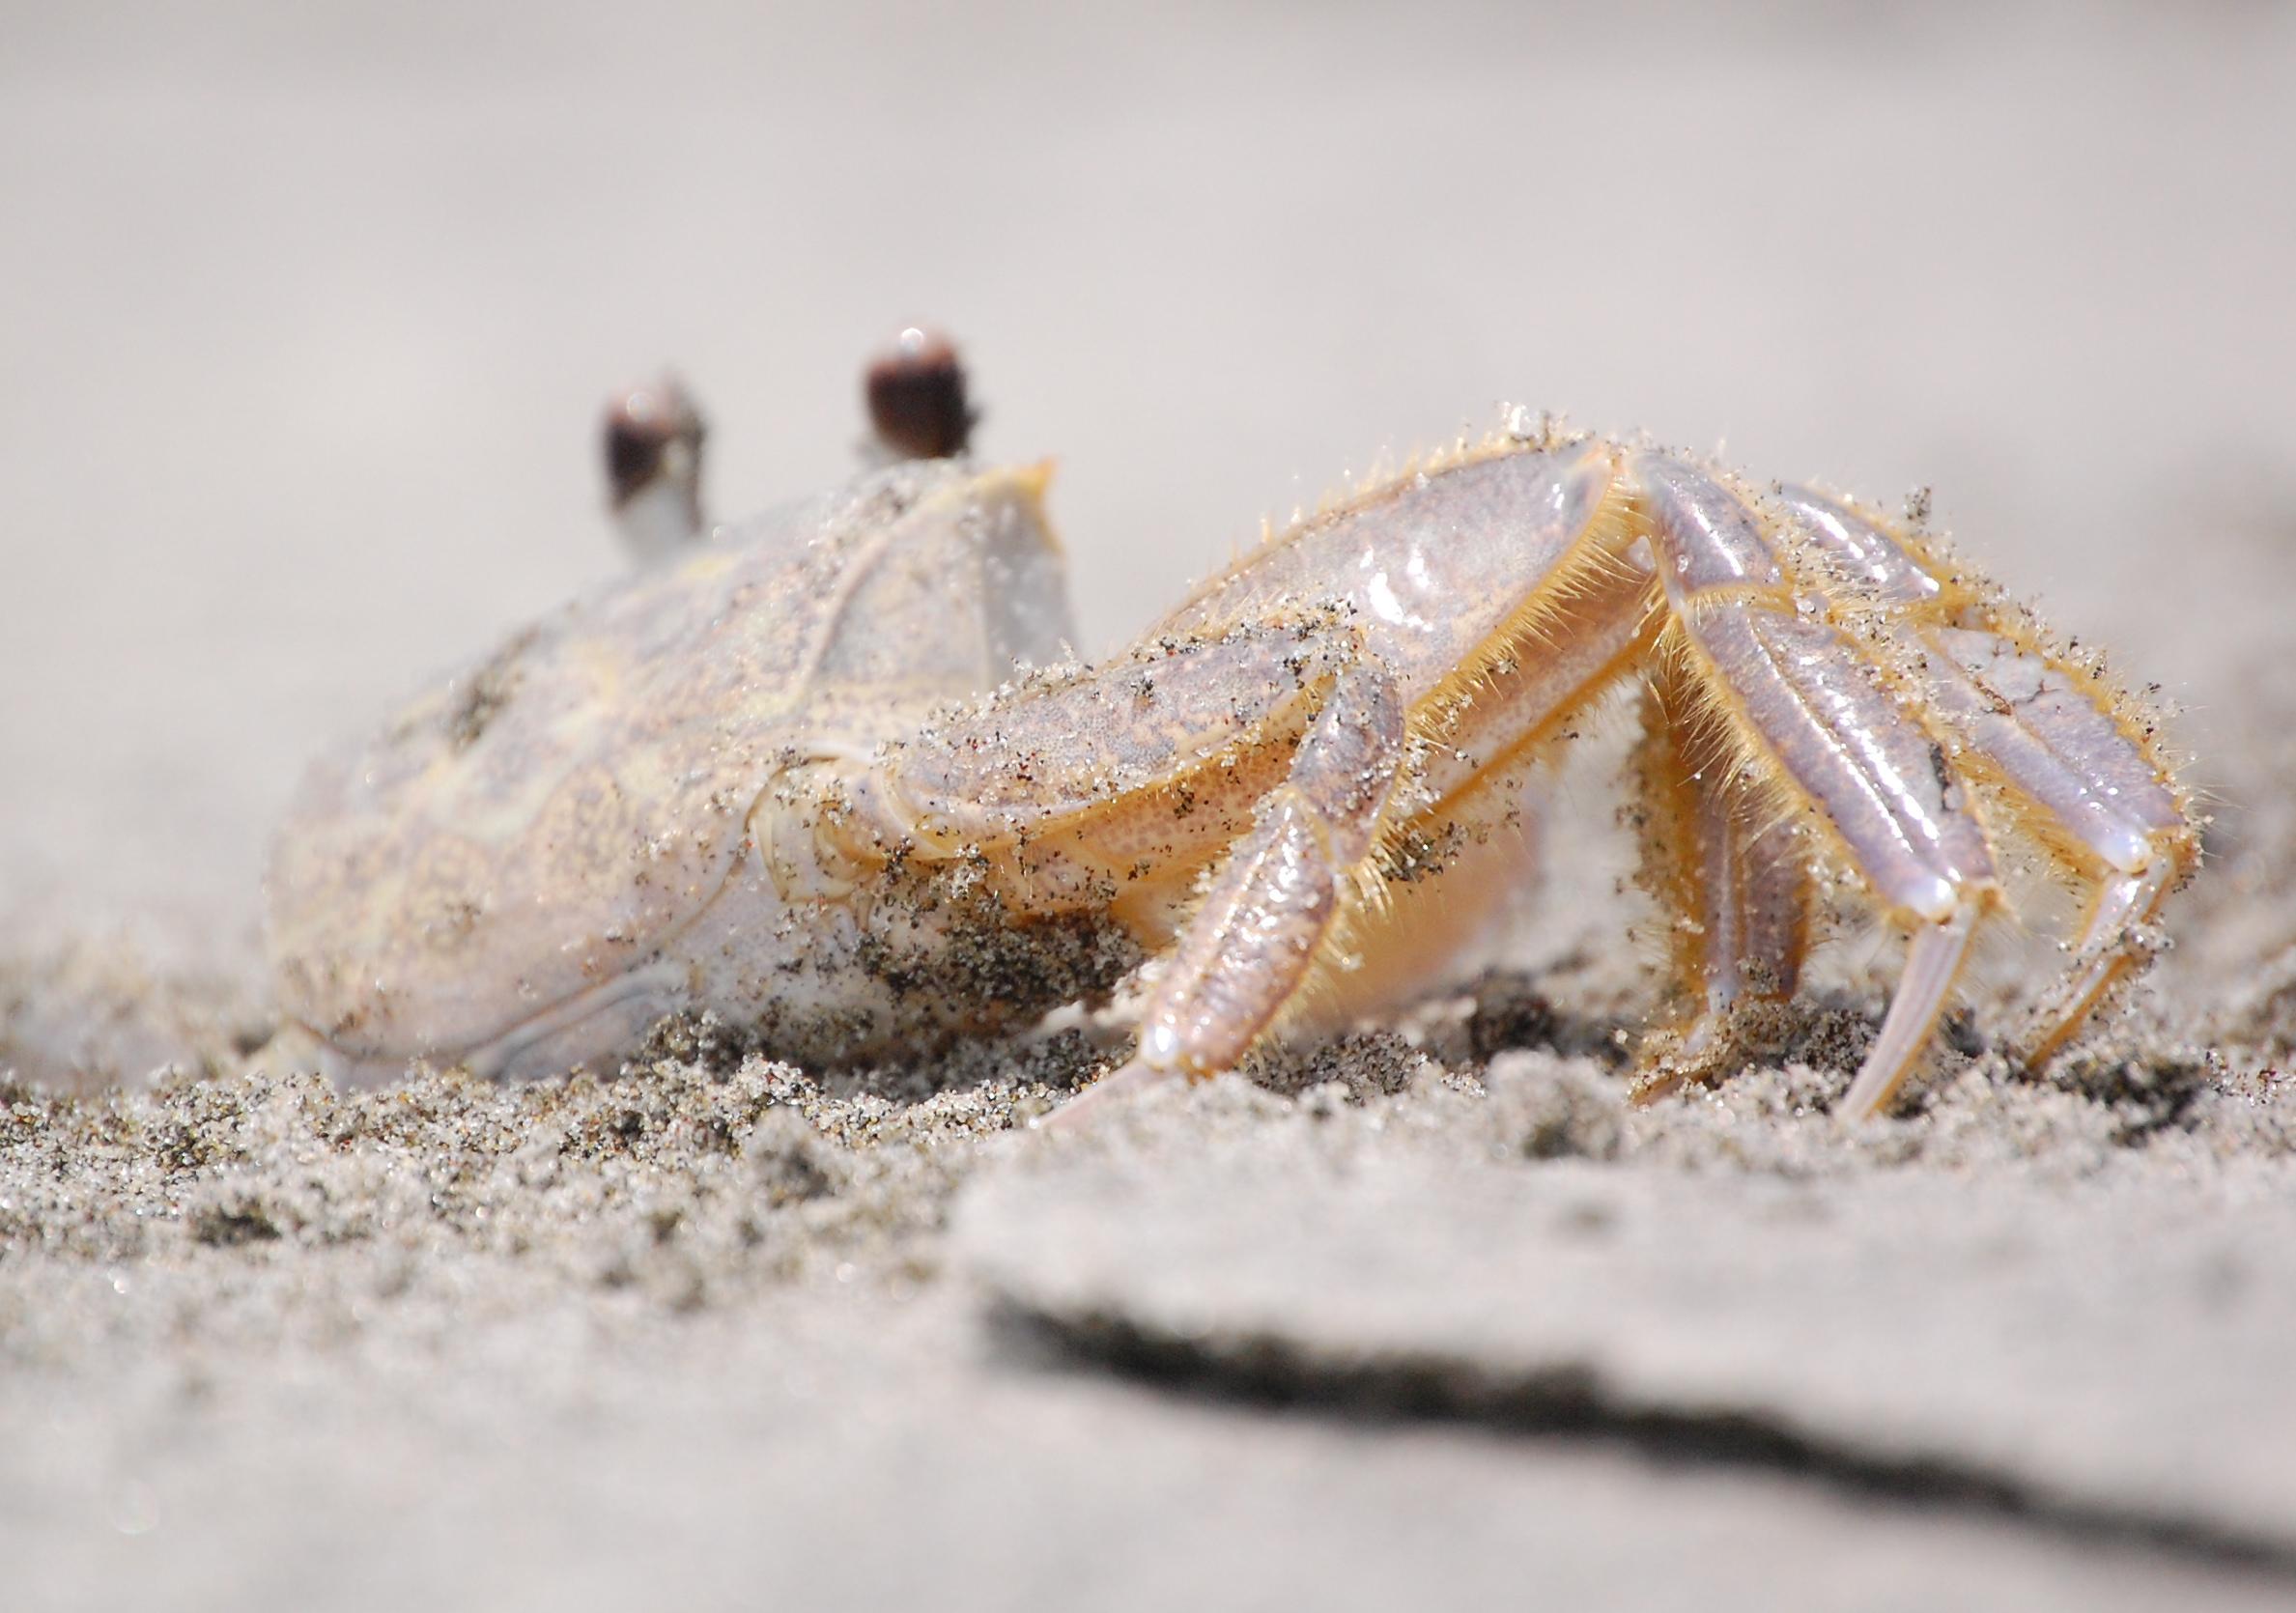 Sand crab close-up, Kiawah Island, SC beach